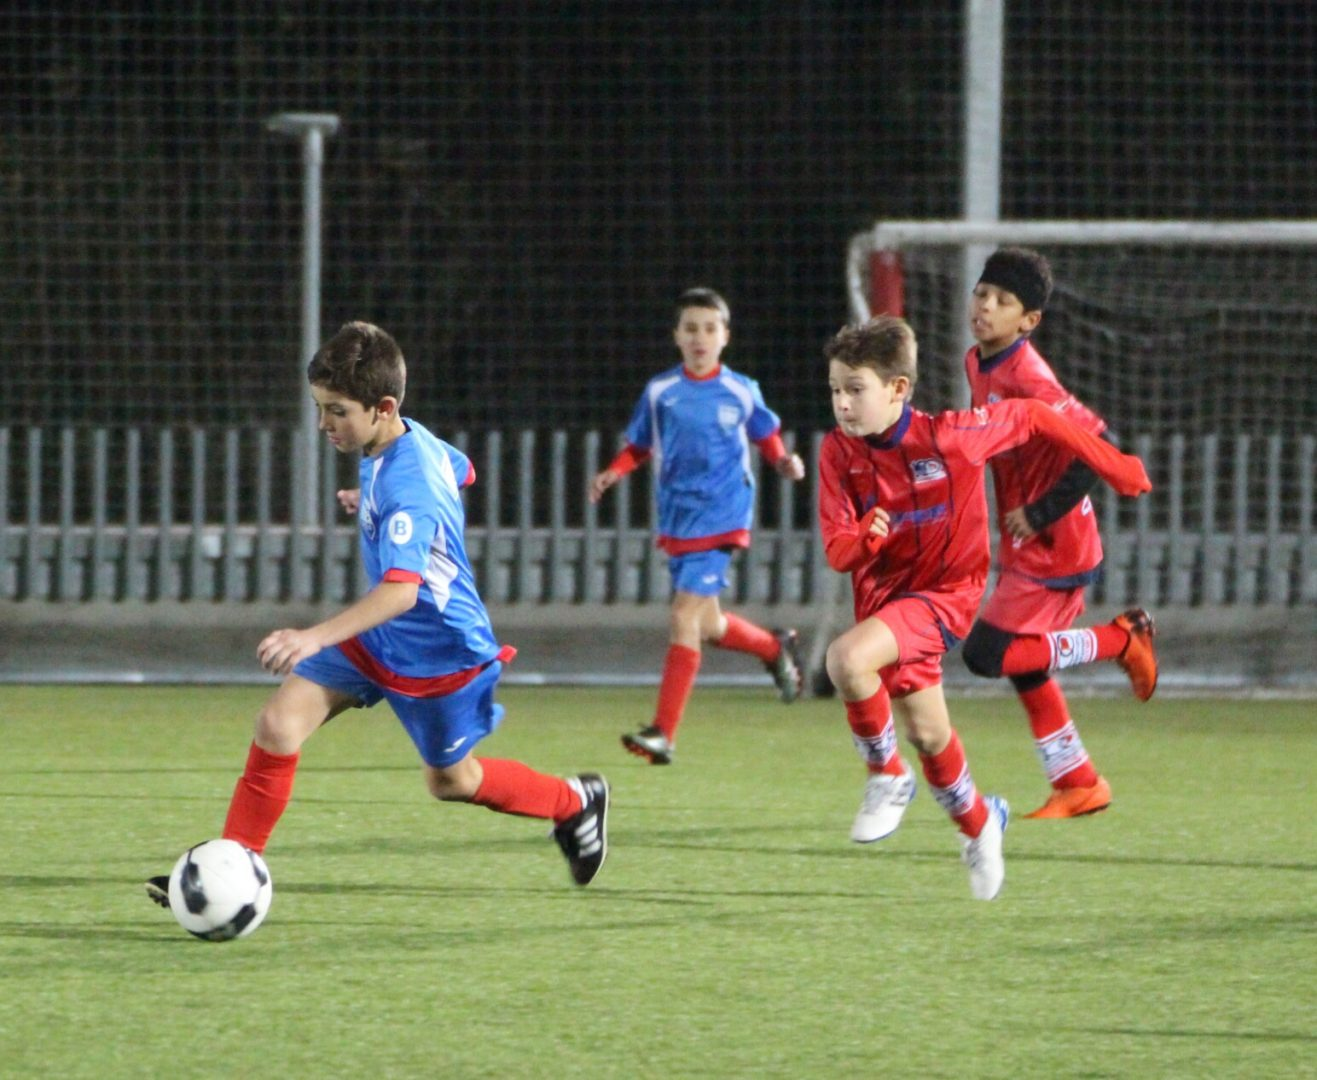 FINAL Torneo Lezama: Indautxu 3-2 Santutxu